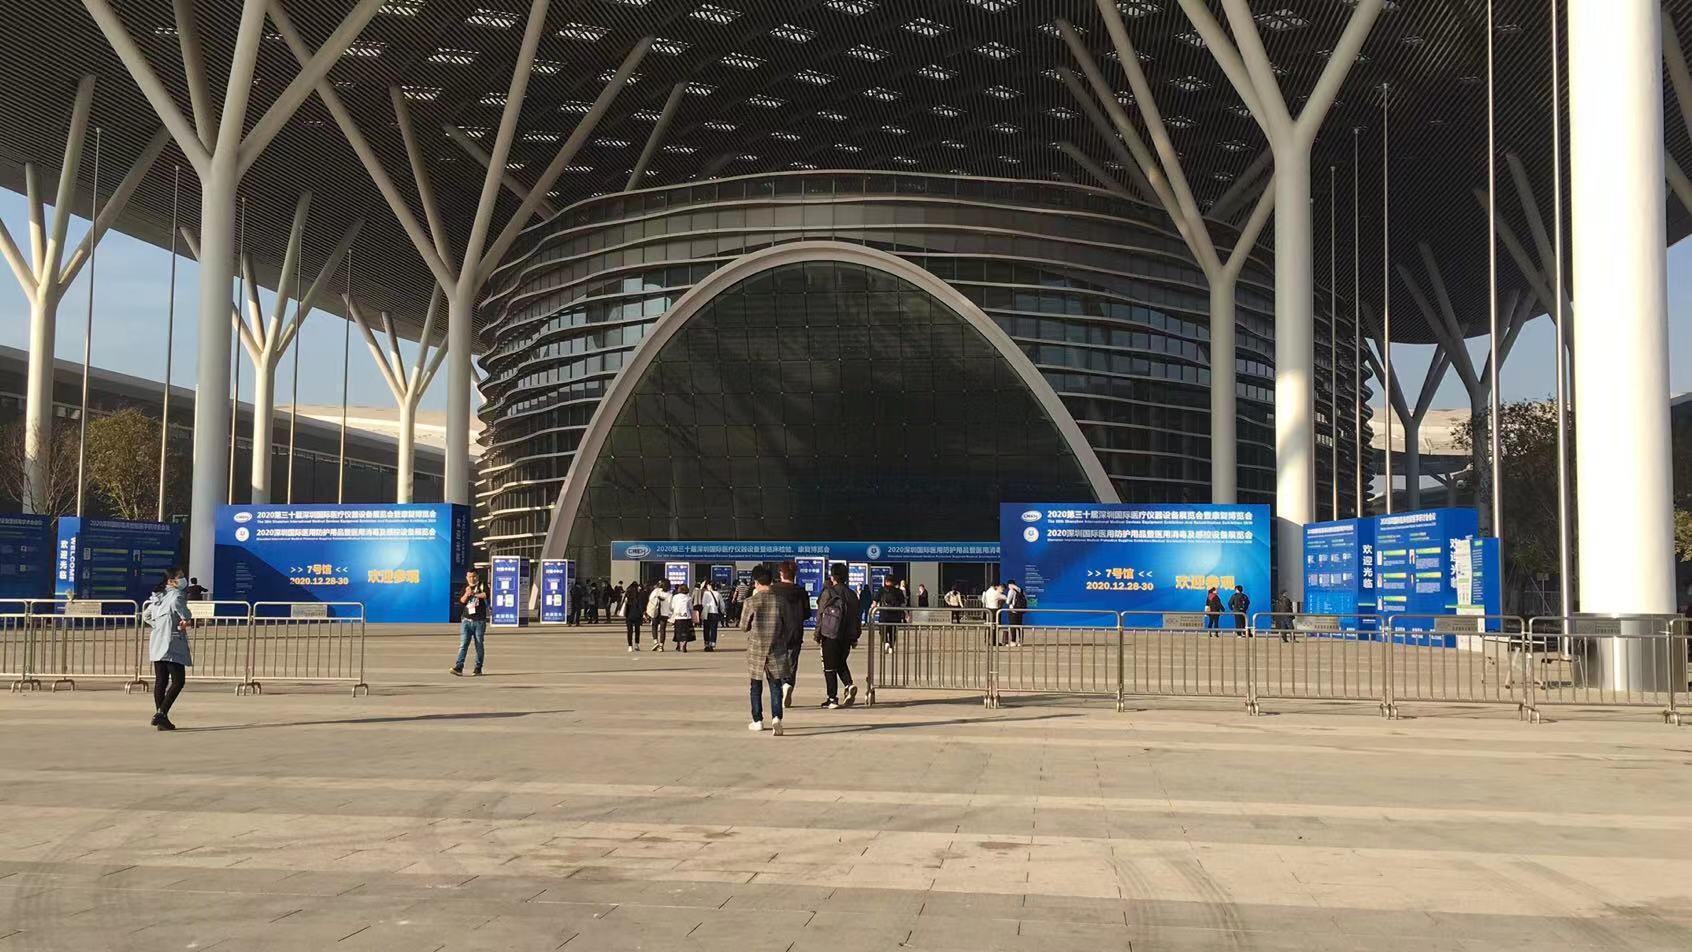 Shenzhen Hongzhou Intelligent Technology Co., Ltd. appeared at the 2020 Shenzhen International Medical Equipment Exhibition!